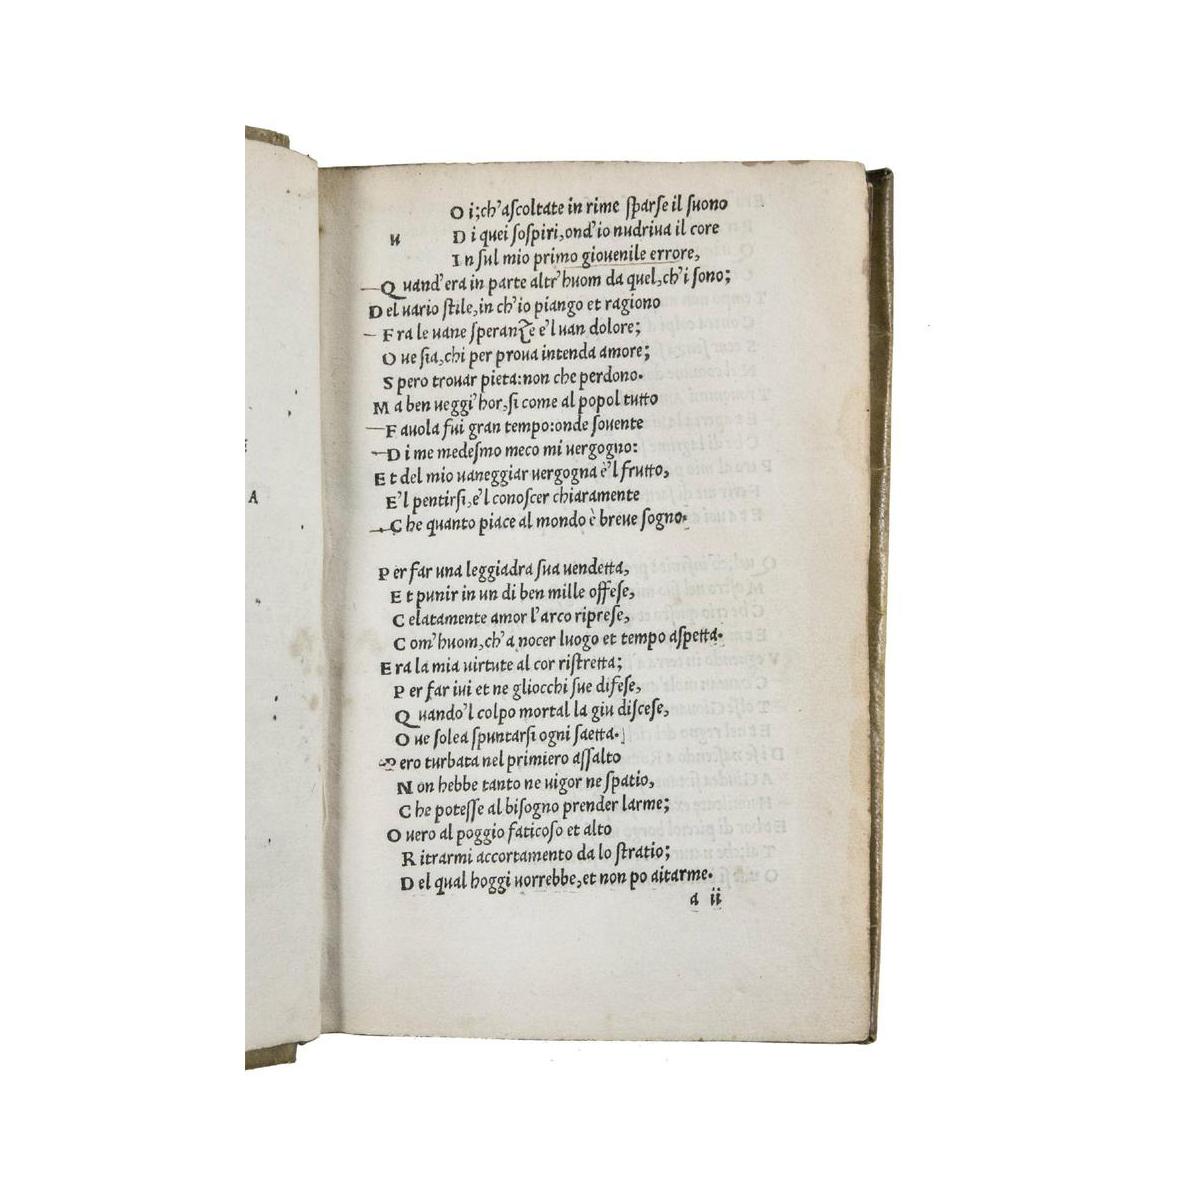 Petrarca counterfeit 1502 1.jpg